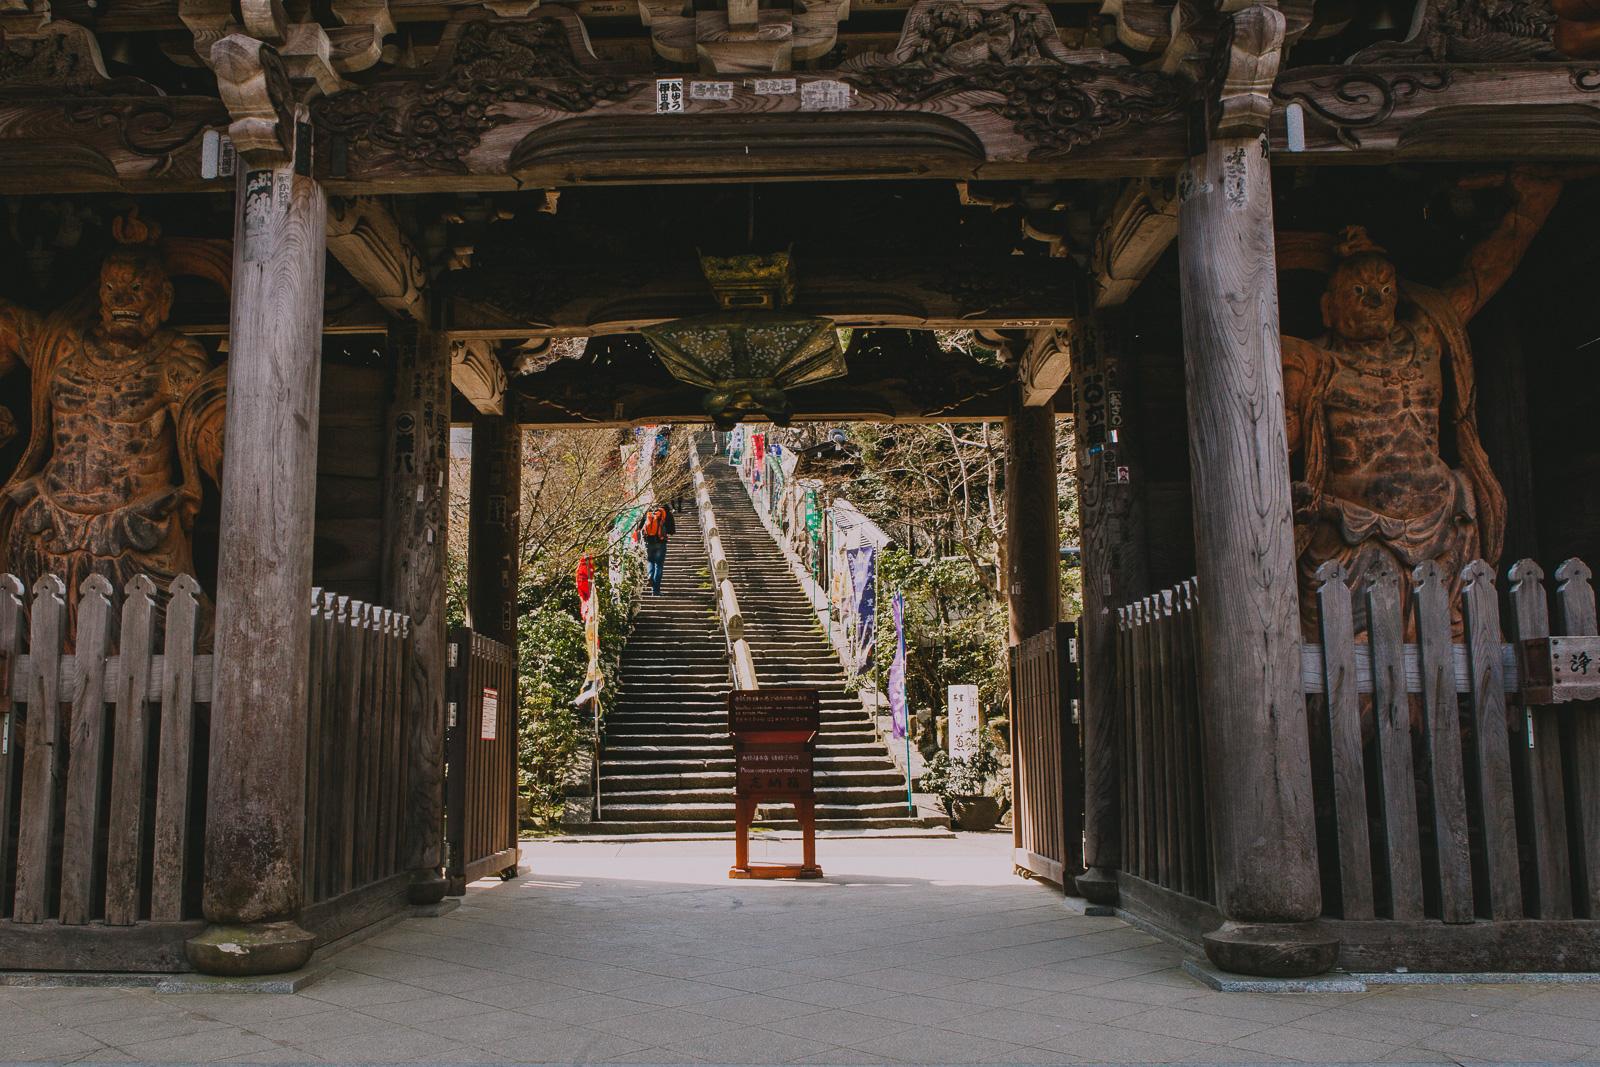 Buddhas in Miyajima Temple: Visiting the Amazing Itsukushima Island, Japan.